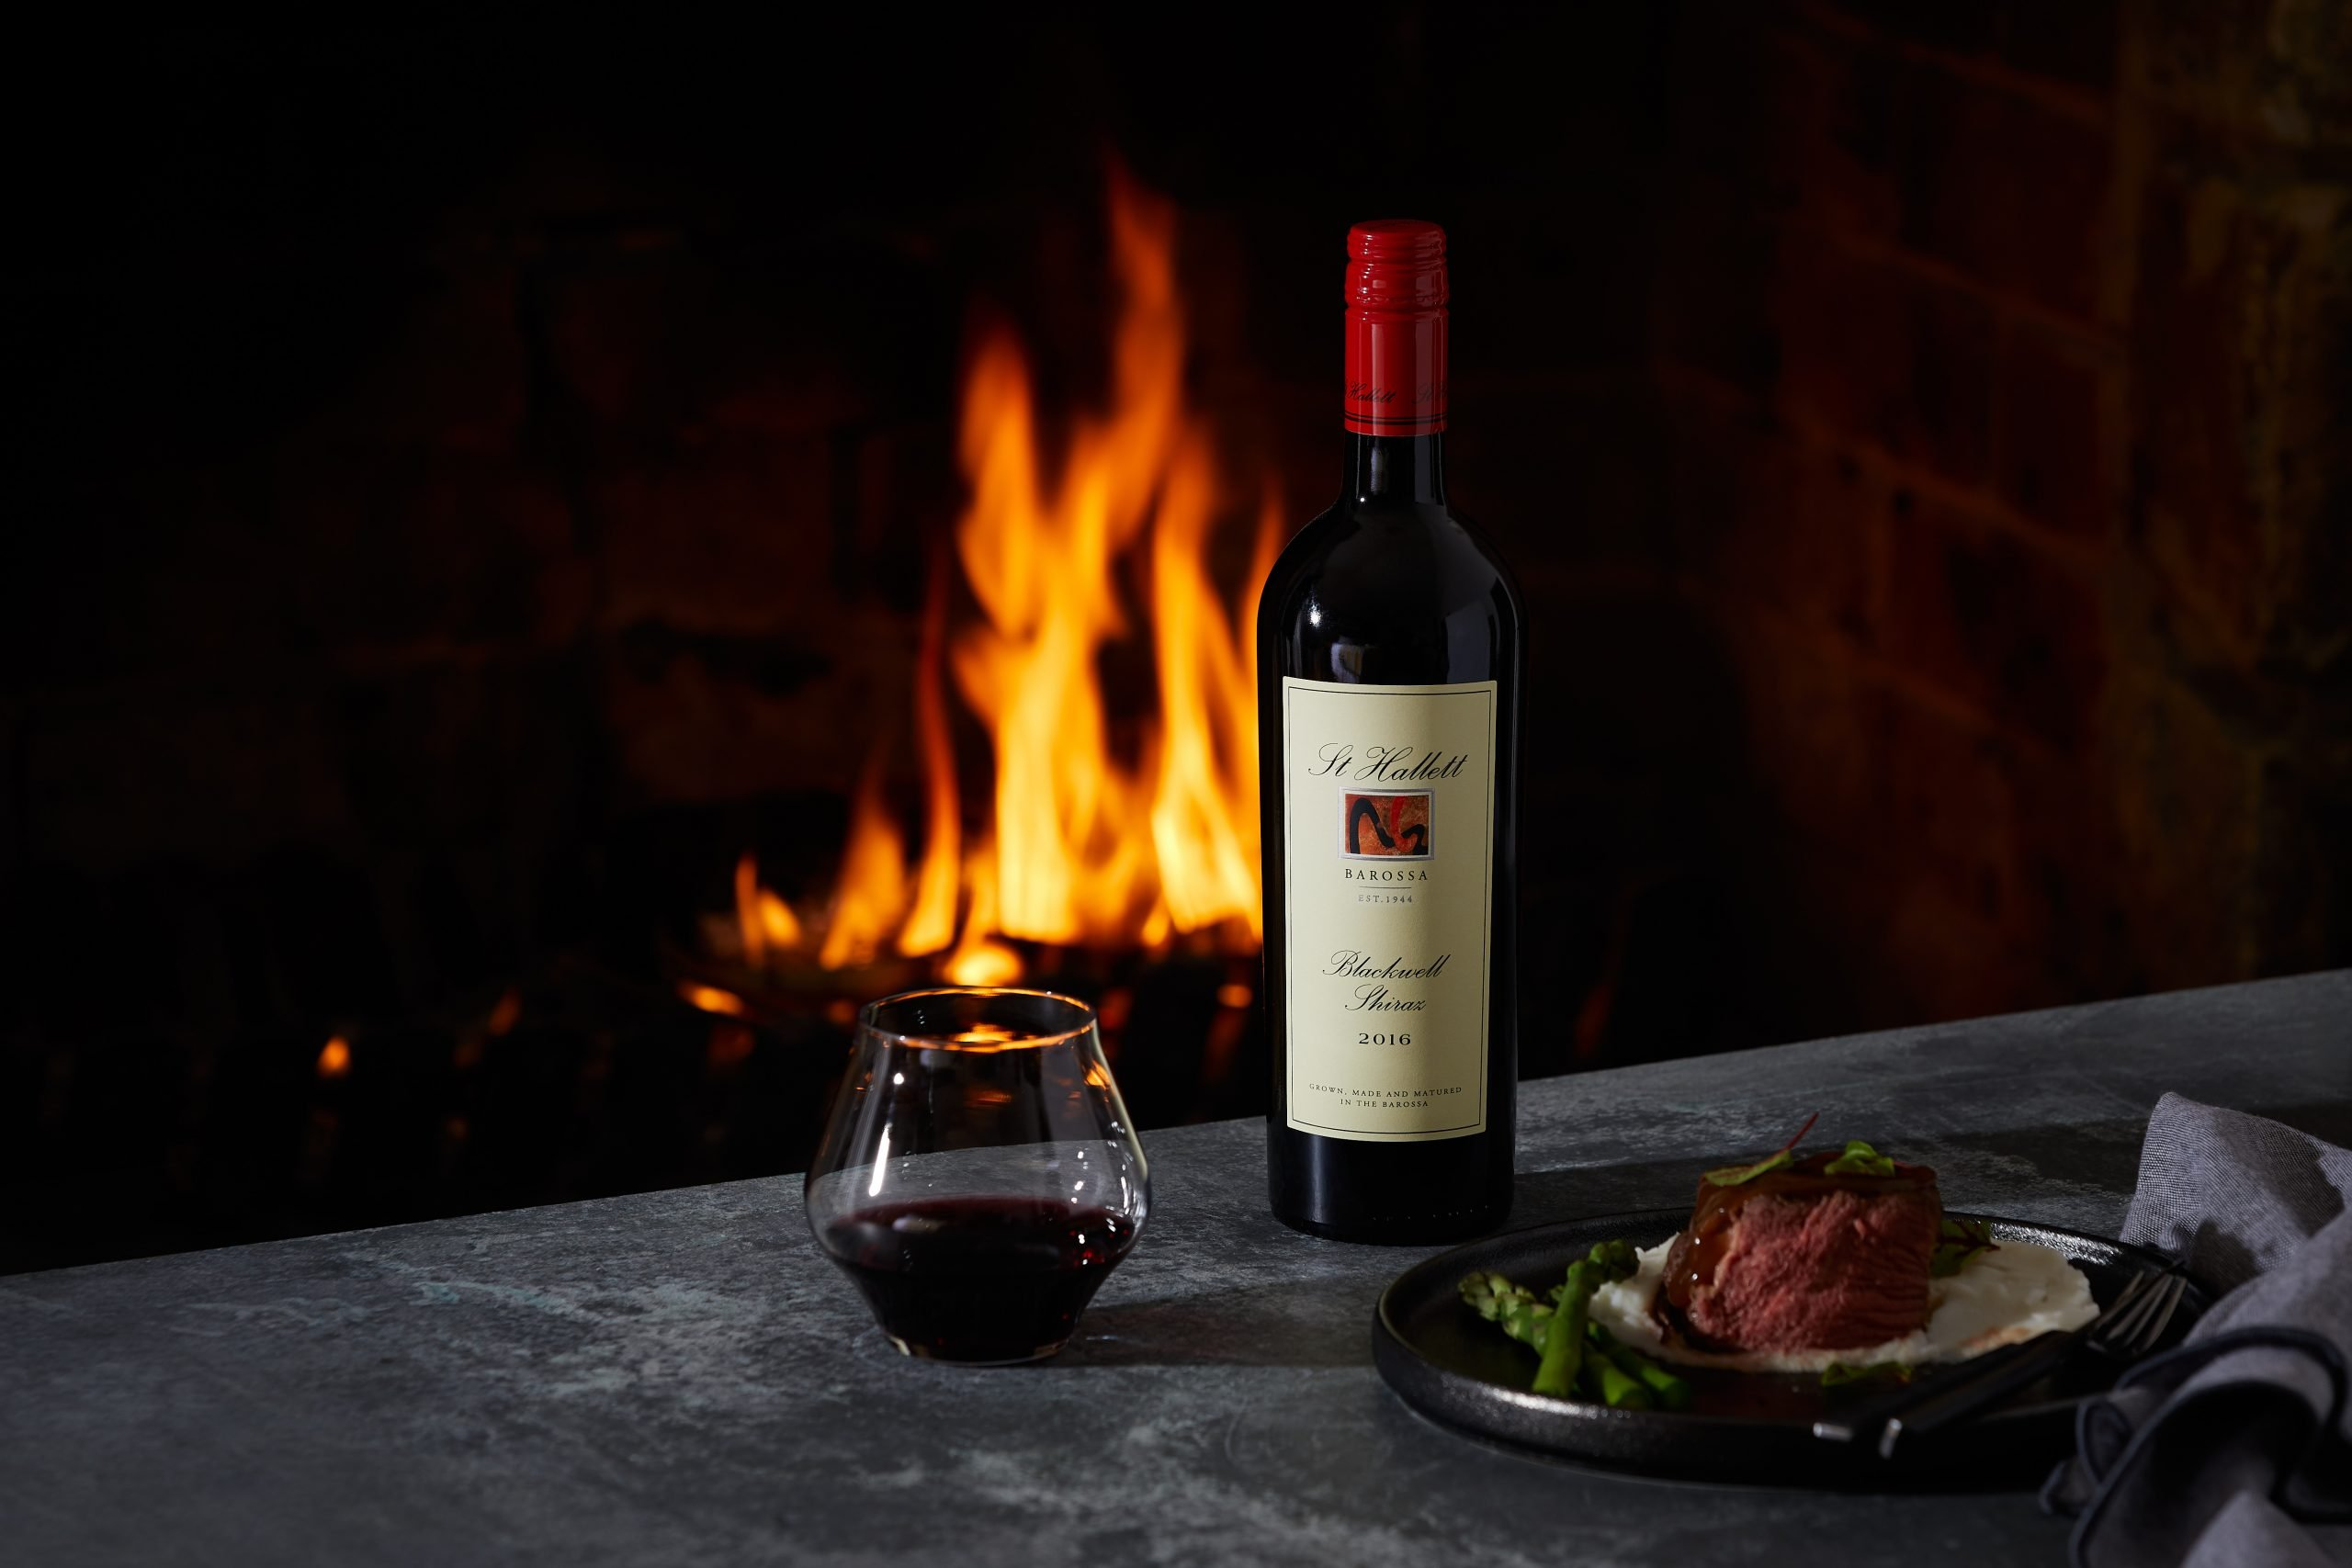 St hallett single vineyard materne shiraz 2020